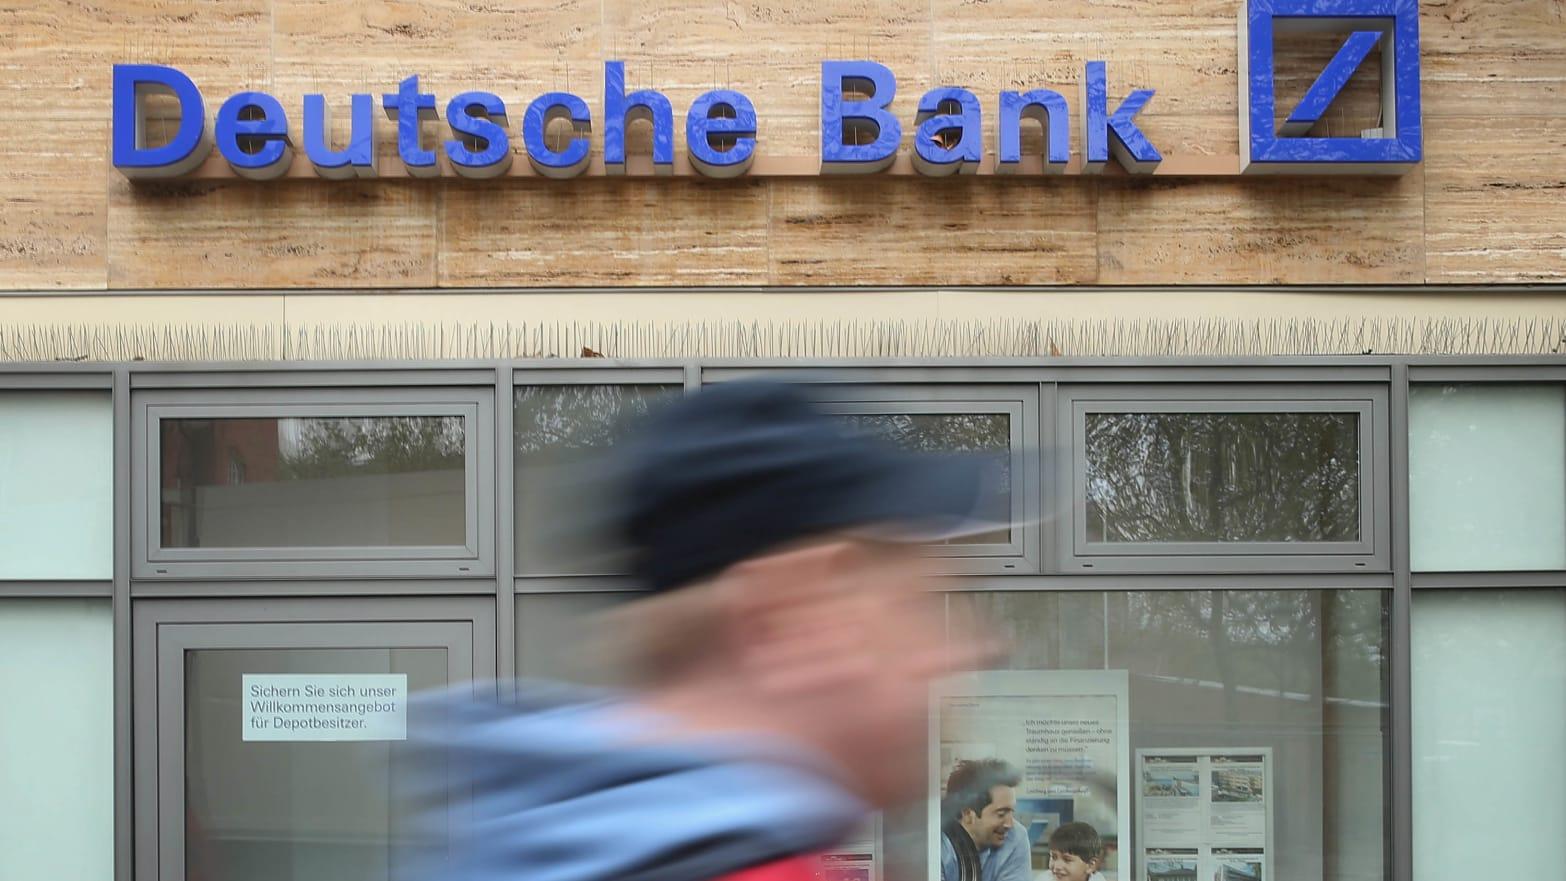 Feds Who Took Down Cohen Could Face Deutsche Bank Dilemma